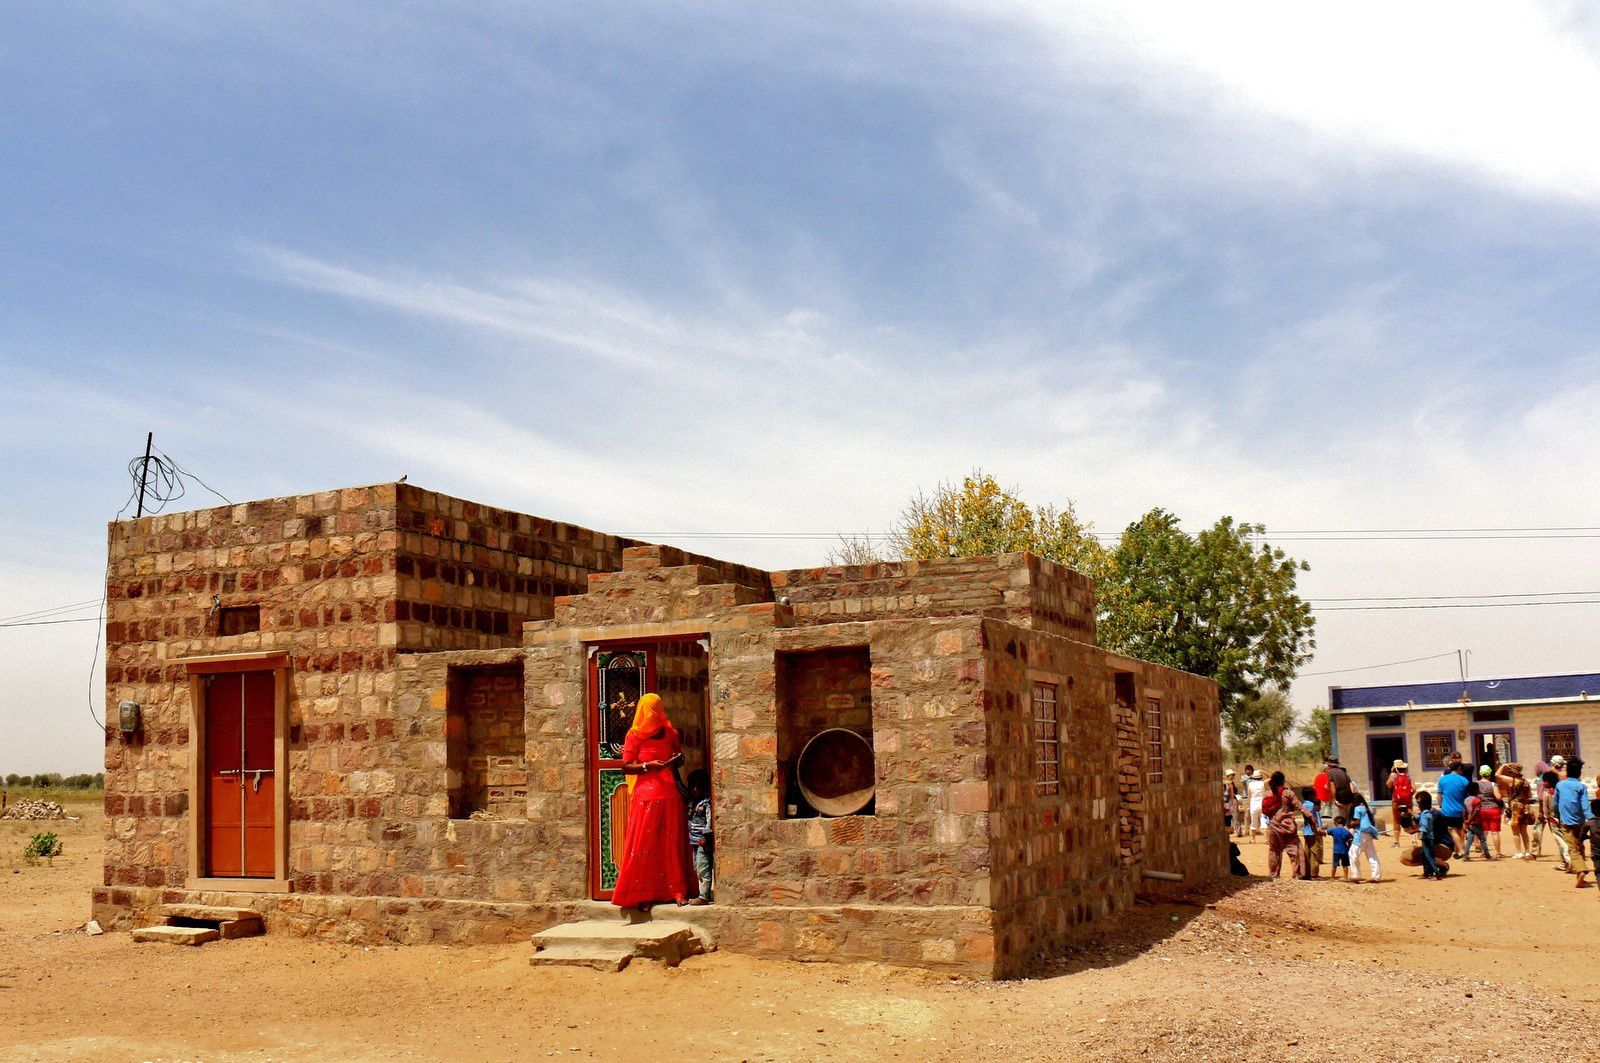 Un village du désert du Thar, Rajasthan (Inde)